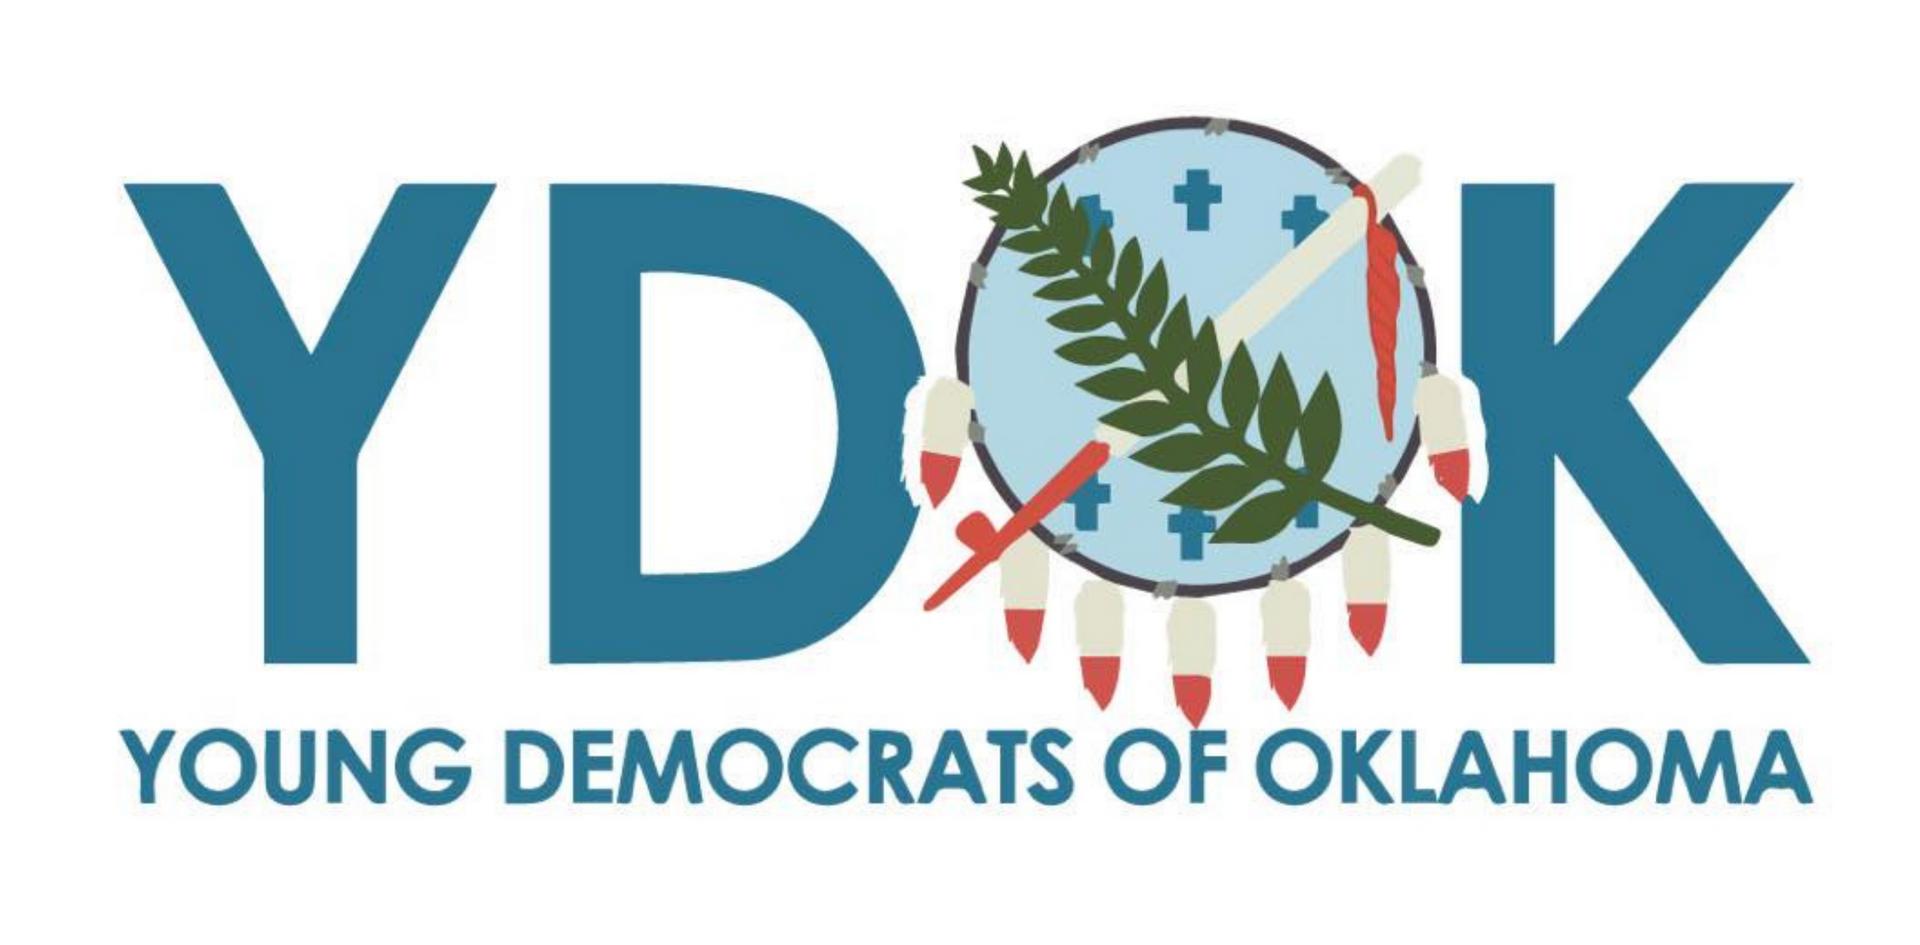 Young Democrats of Oklahoma Facebook Page